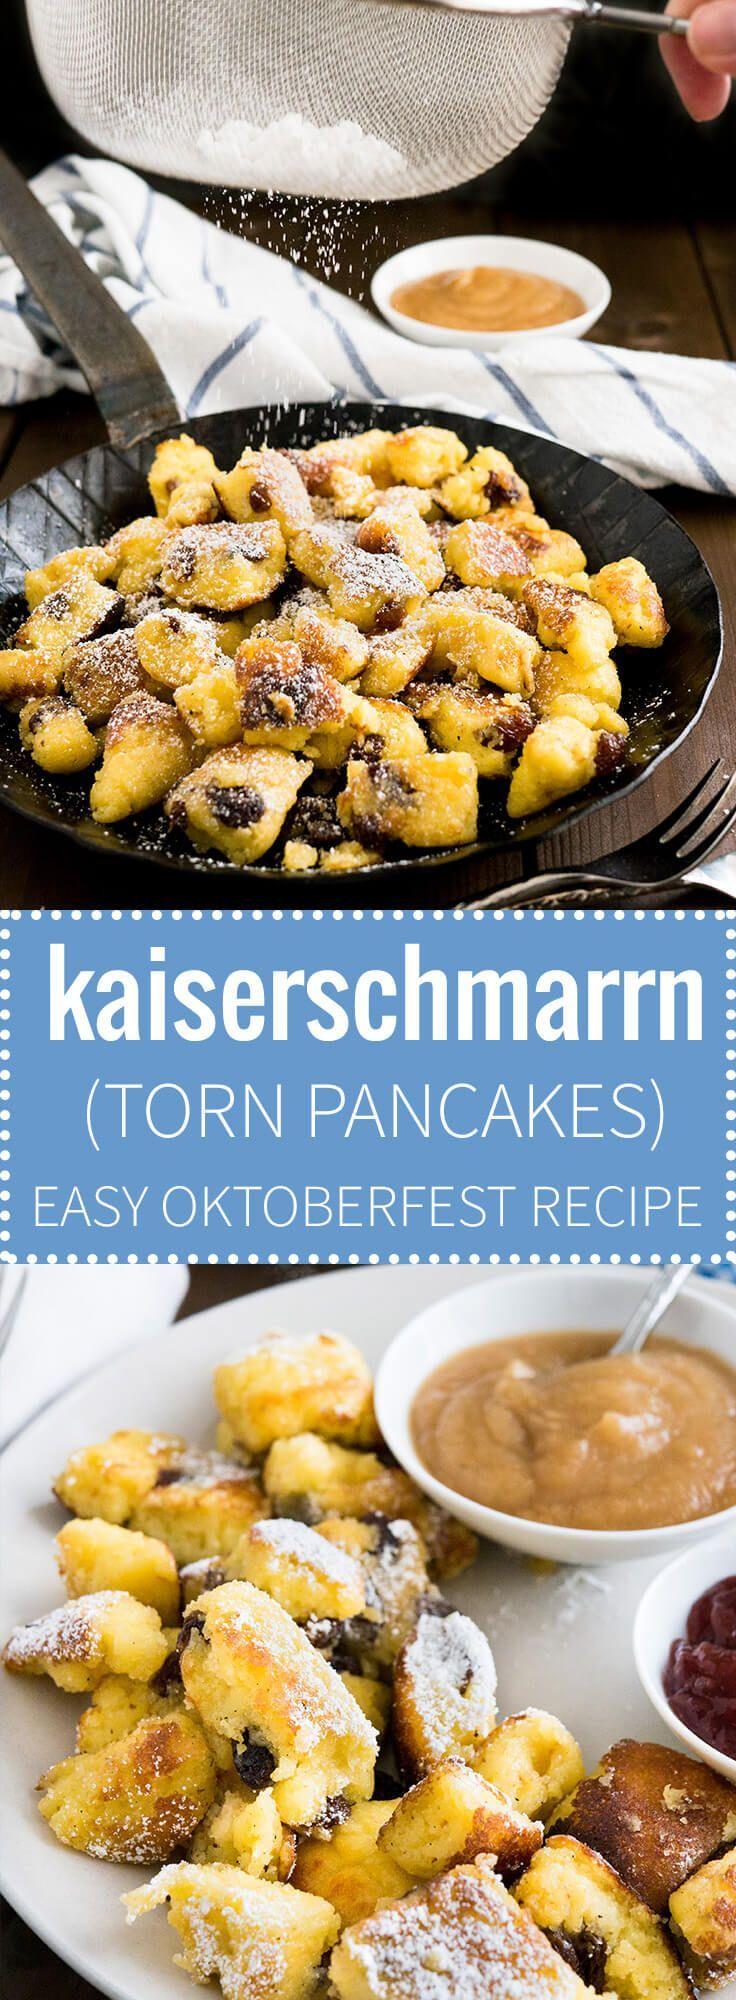 oktoberfest dessert recipes